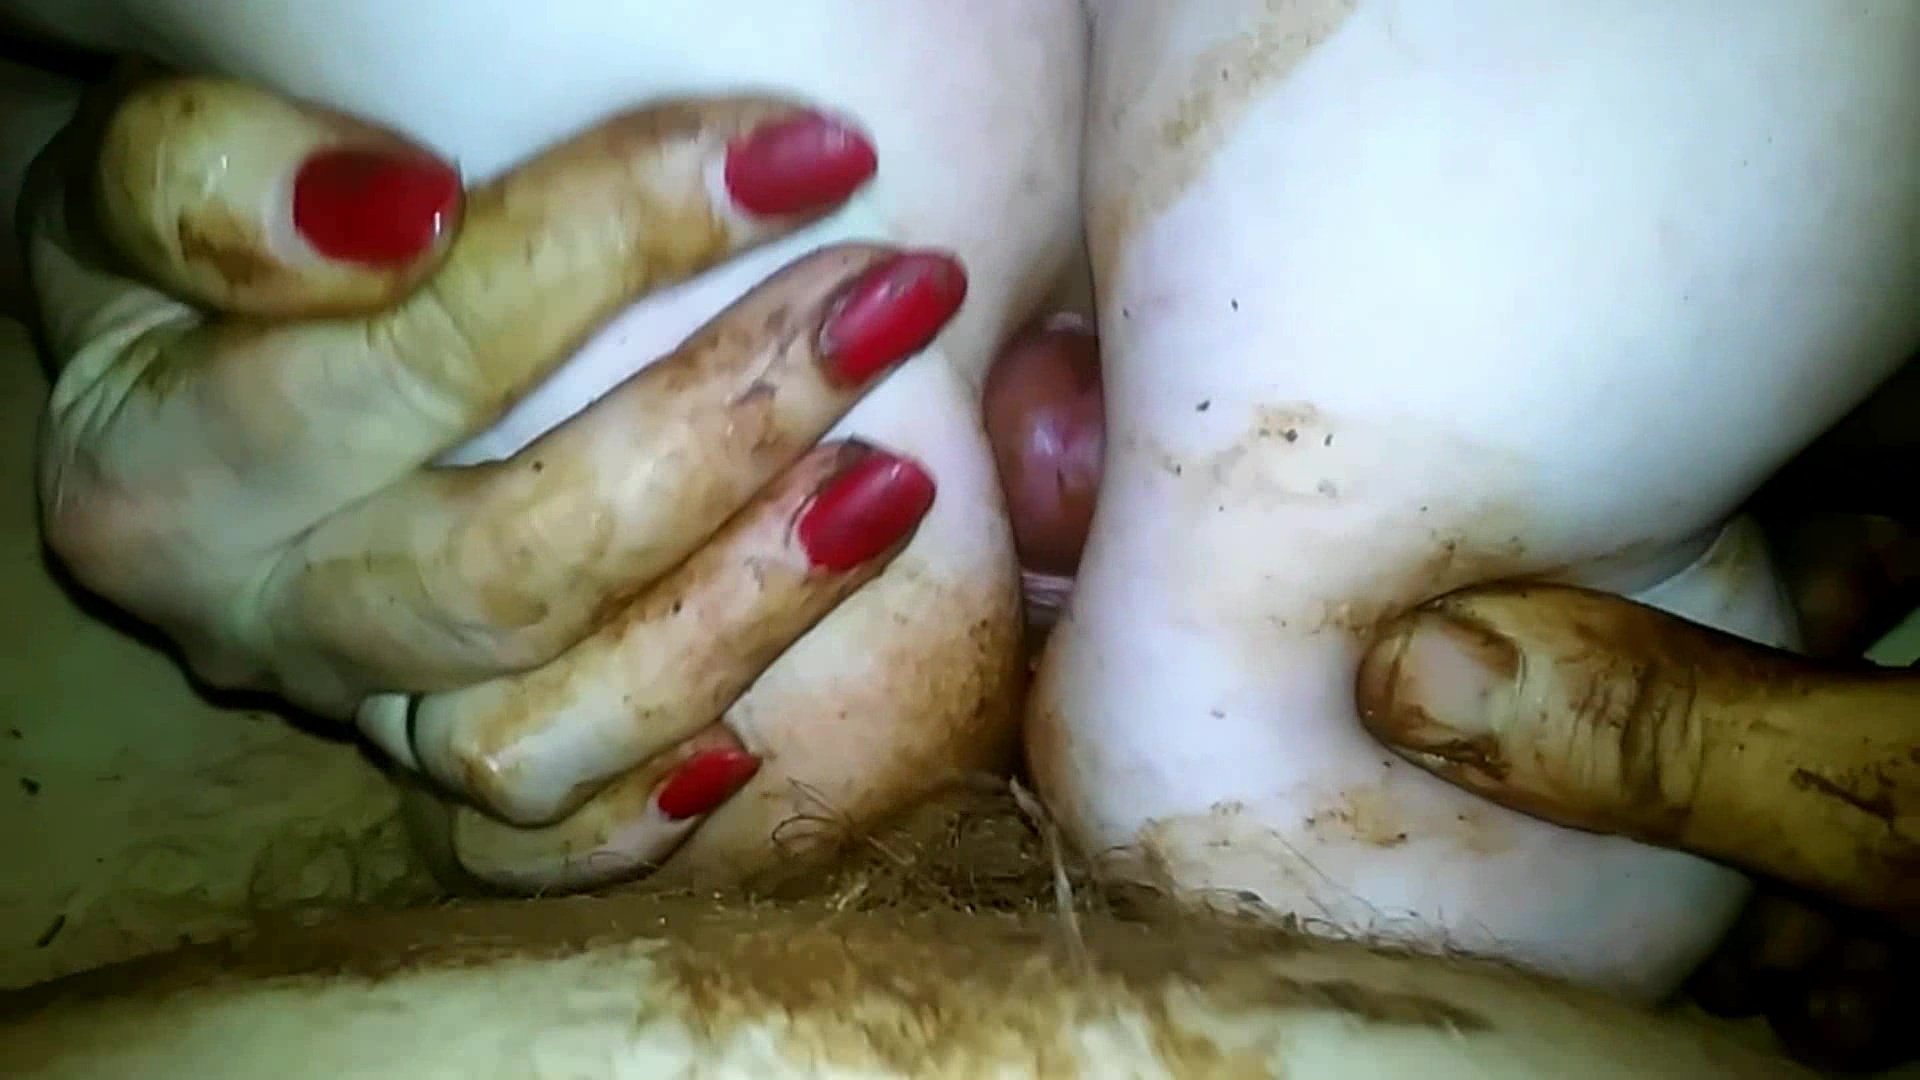 dirtyamateurs - messy titty fucking and cumming